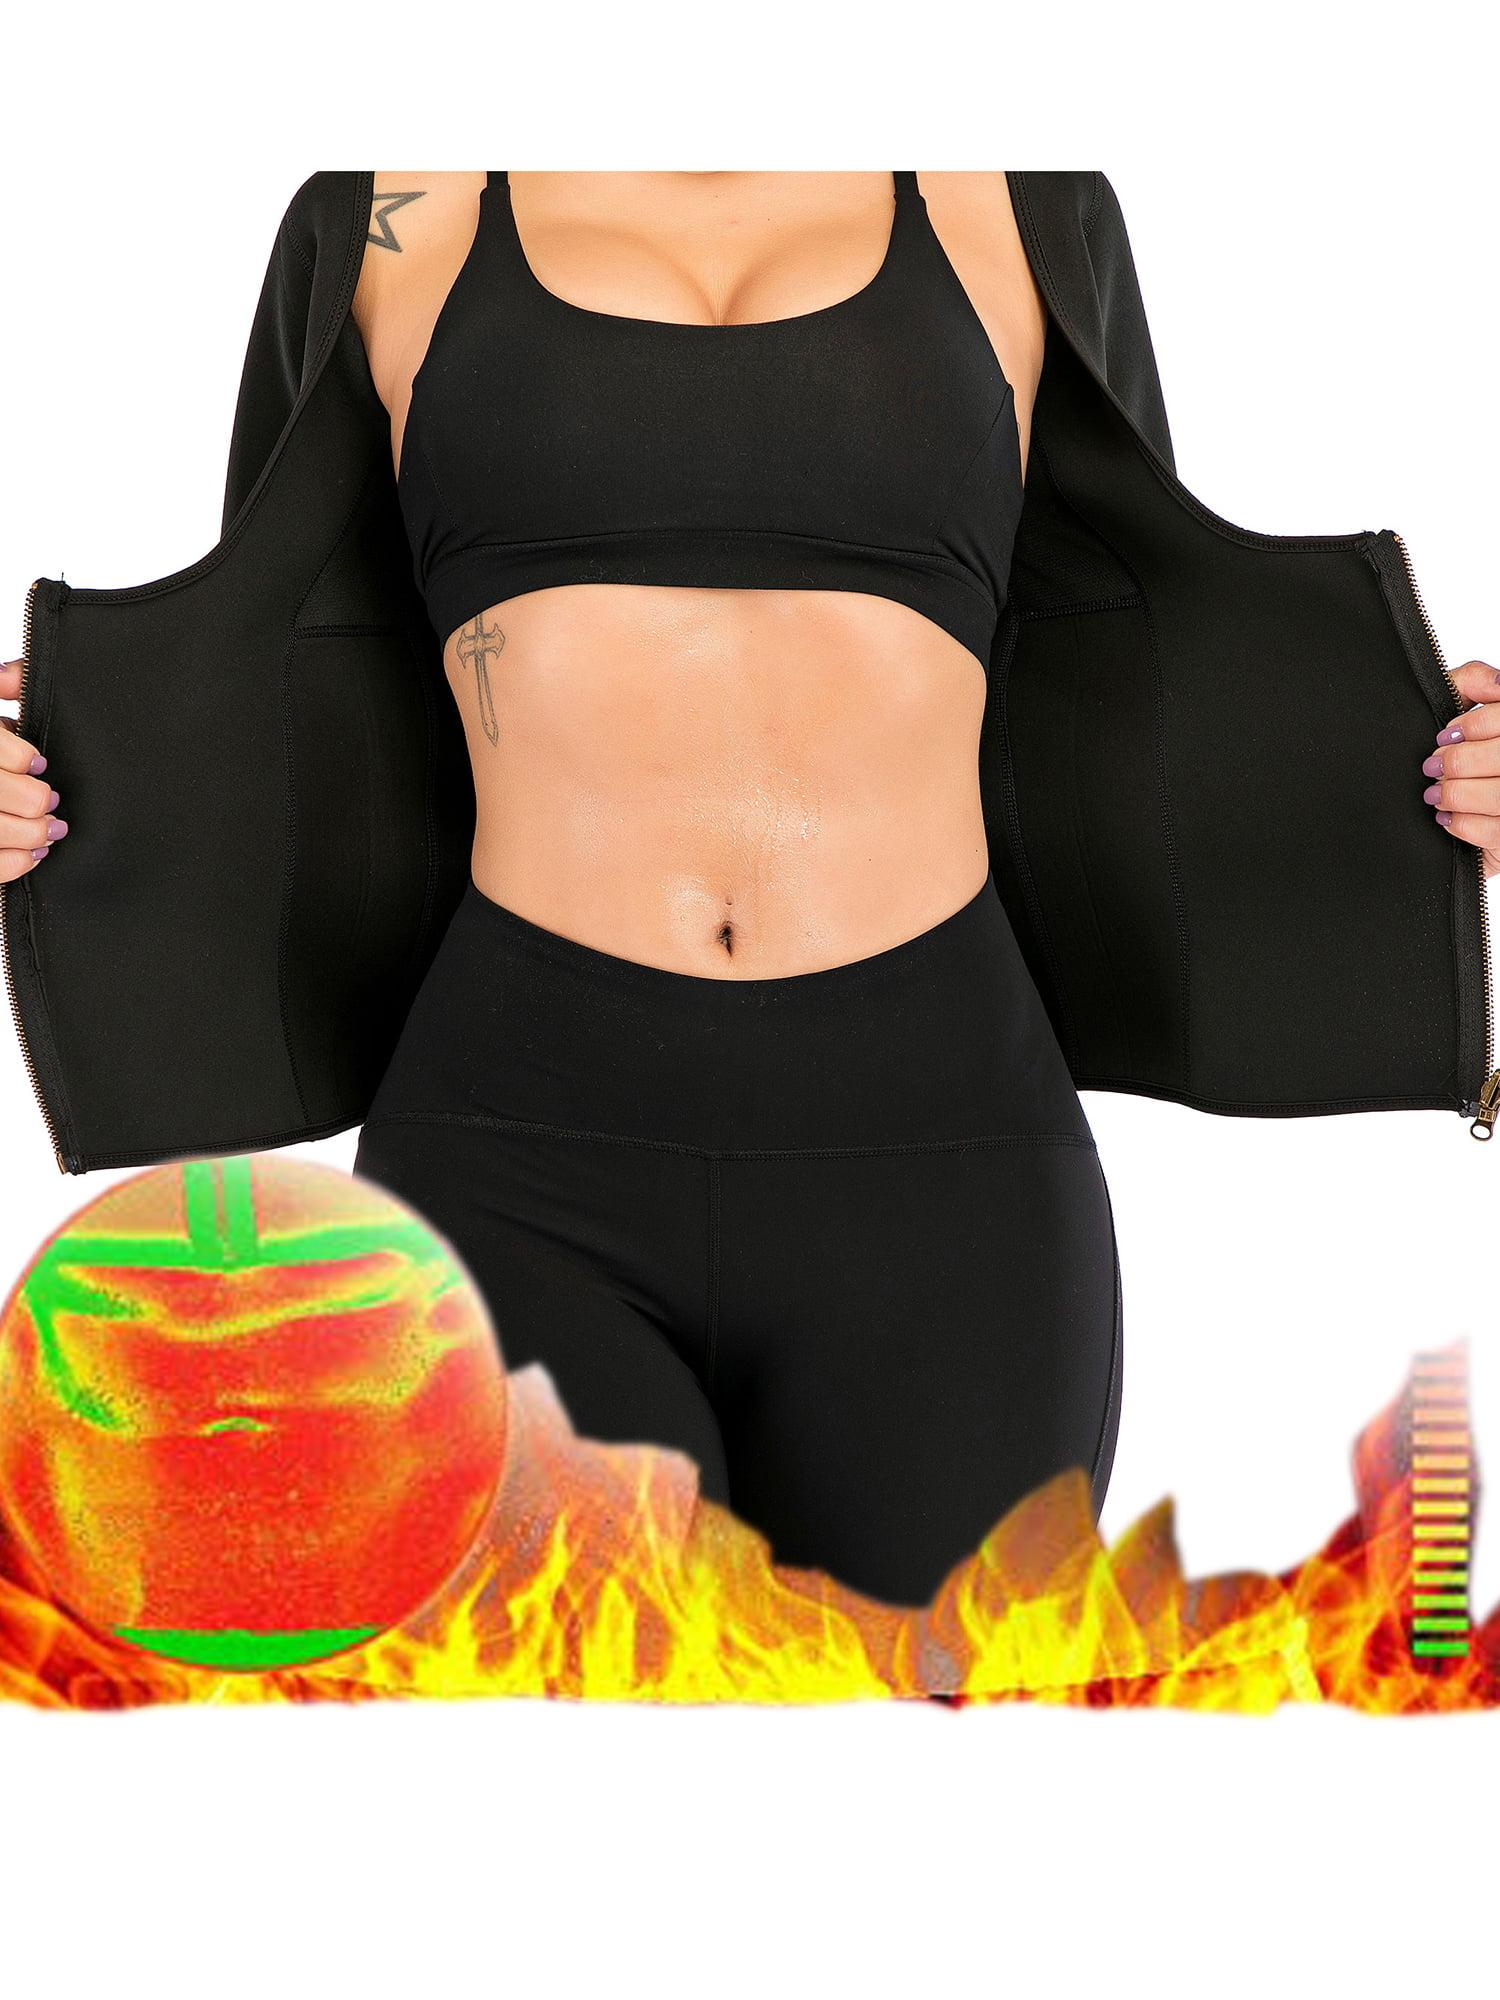 Thermal Neoprene Sport Slimming Shirt Workout Women Body Shaper T-Shirt